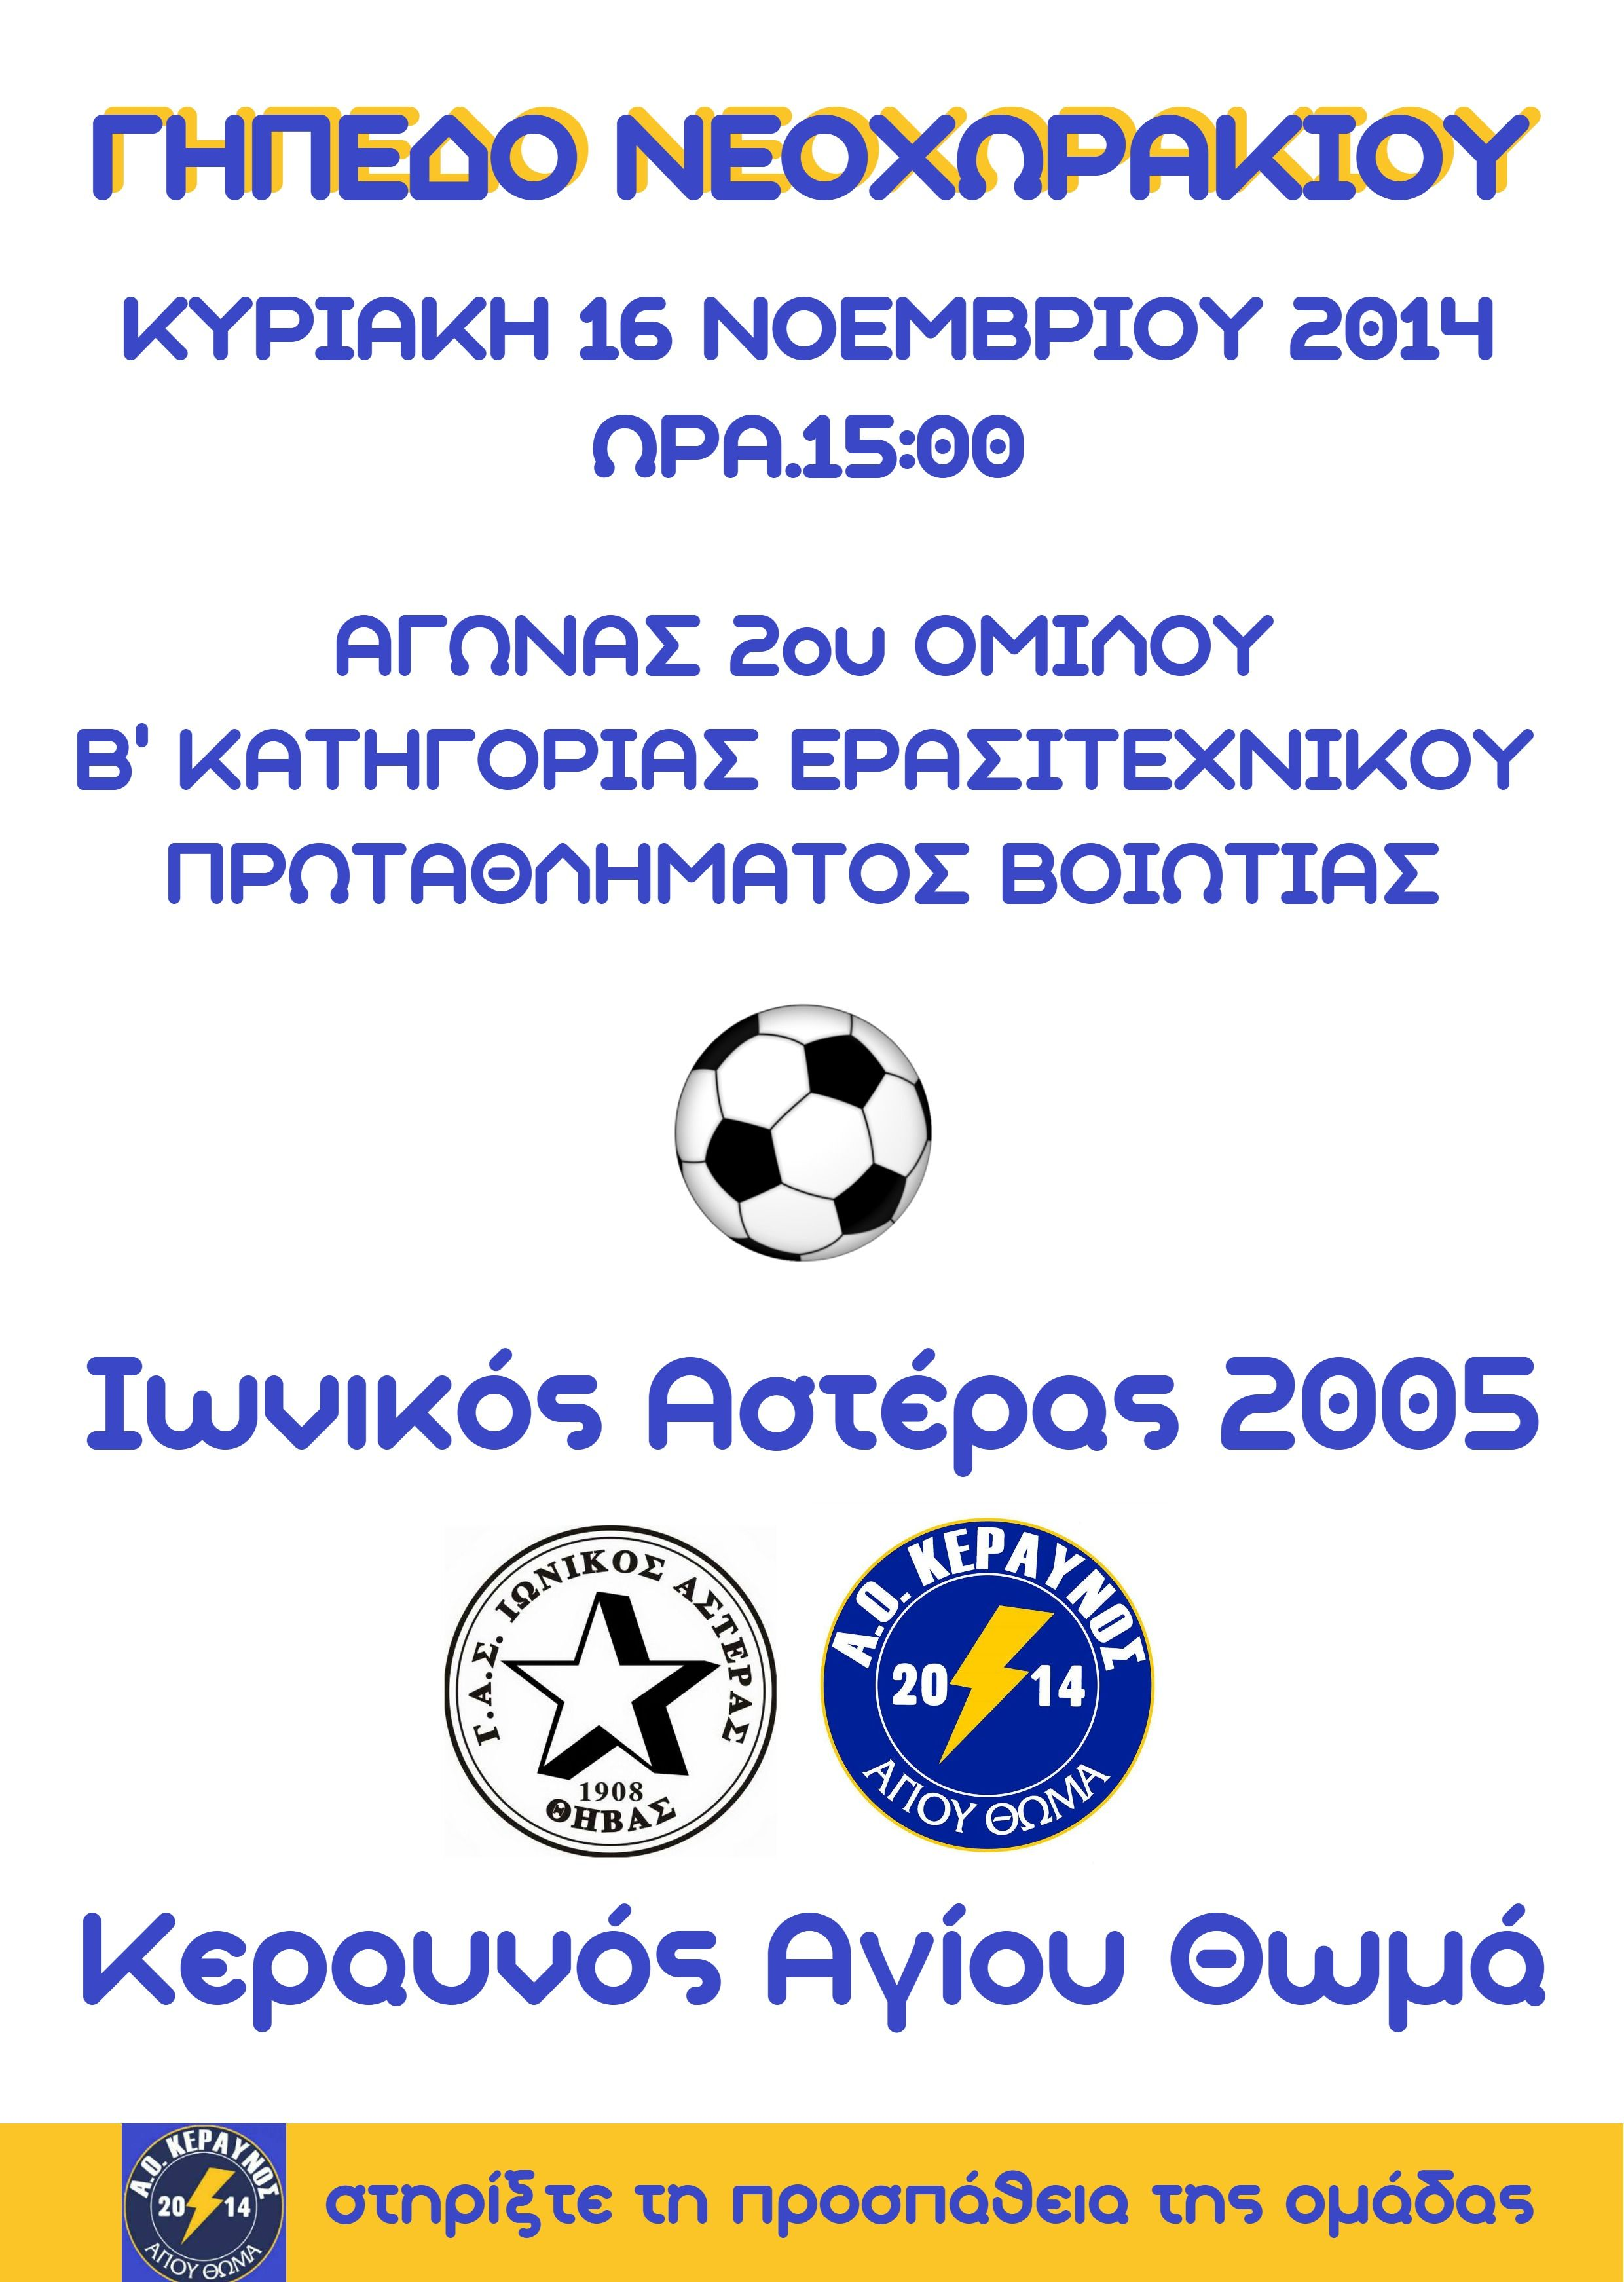 #kerafnos #Ionikos_asteras #thiva #viotia #podosfairo #epsb #agiosthomas